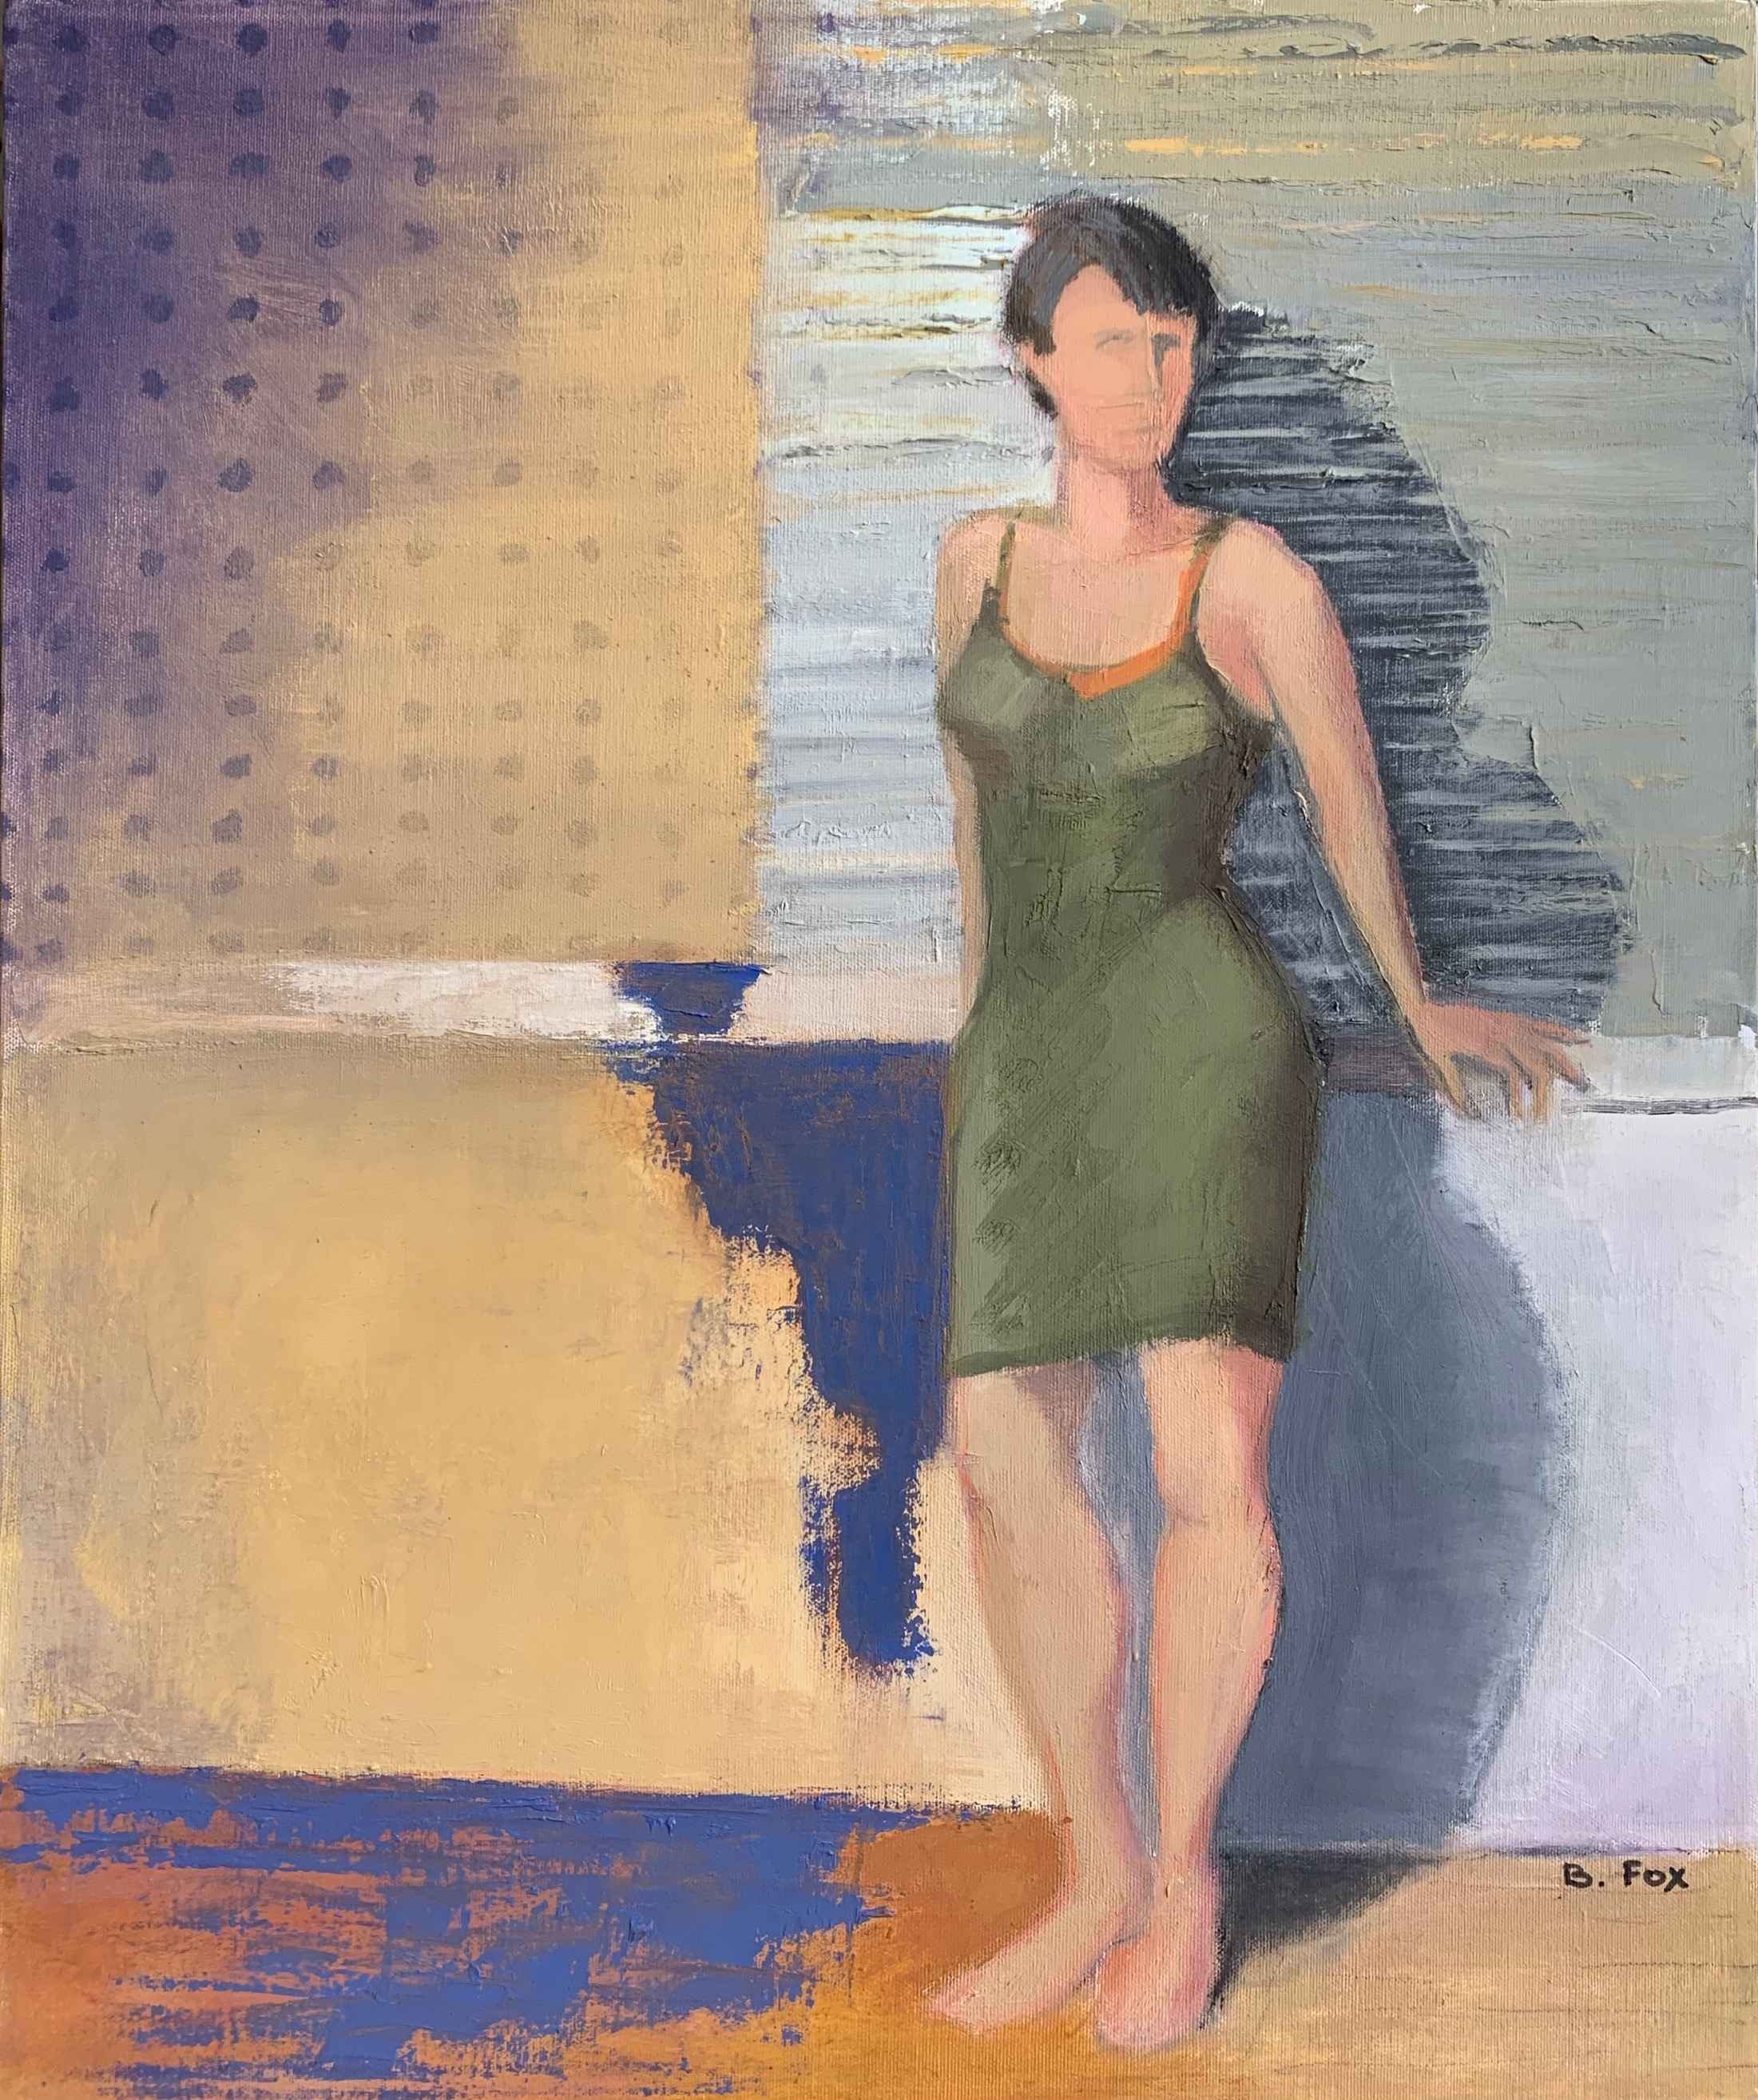 Shadow Play by  Brenda Fox - Masterpiece Online